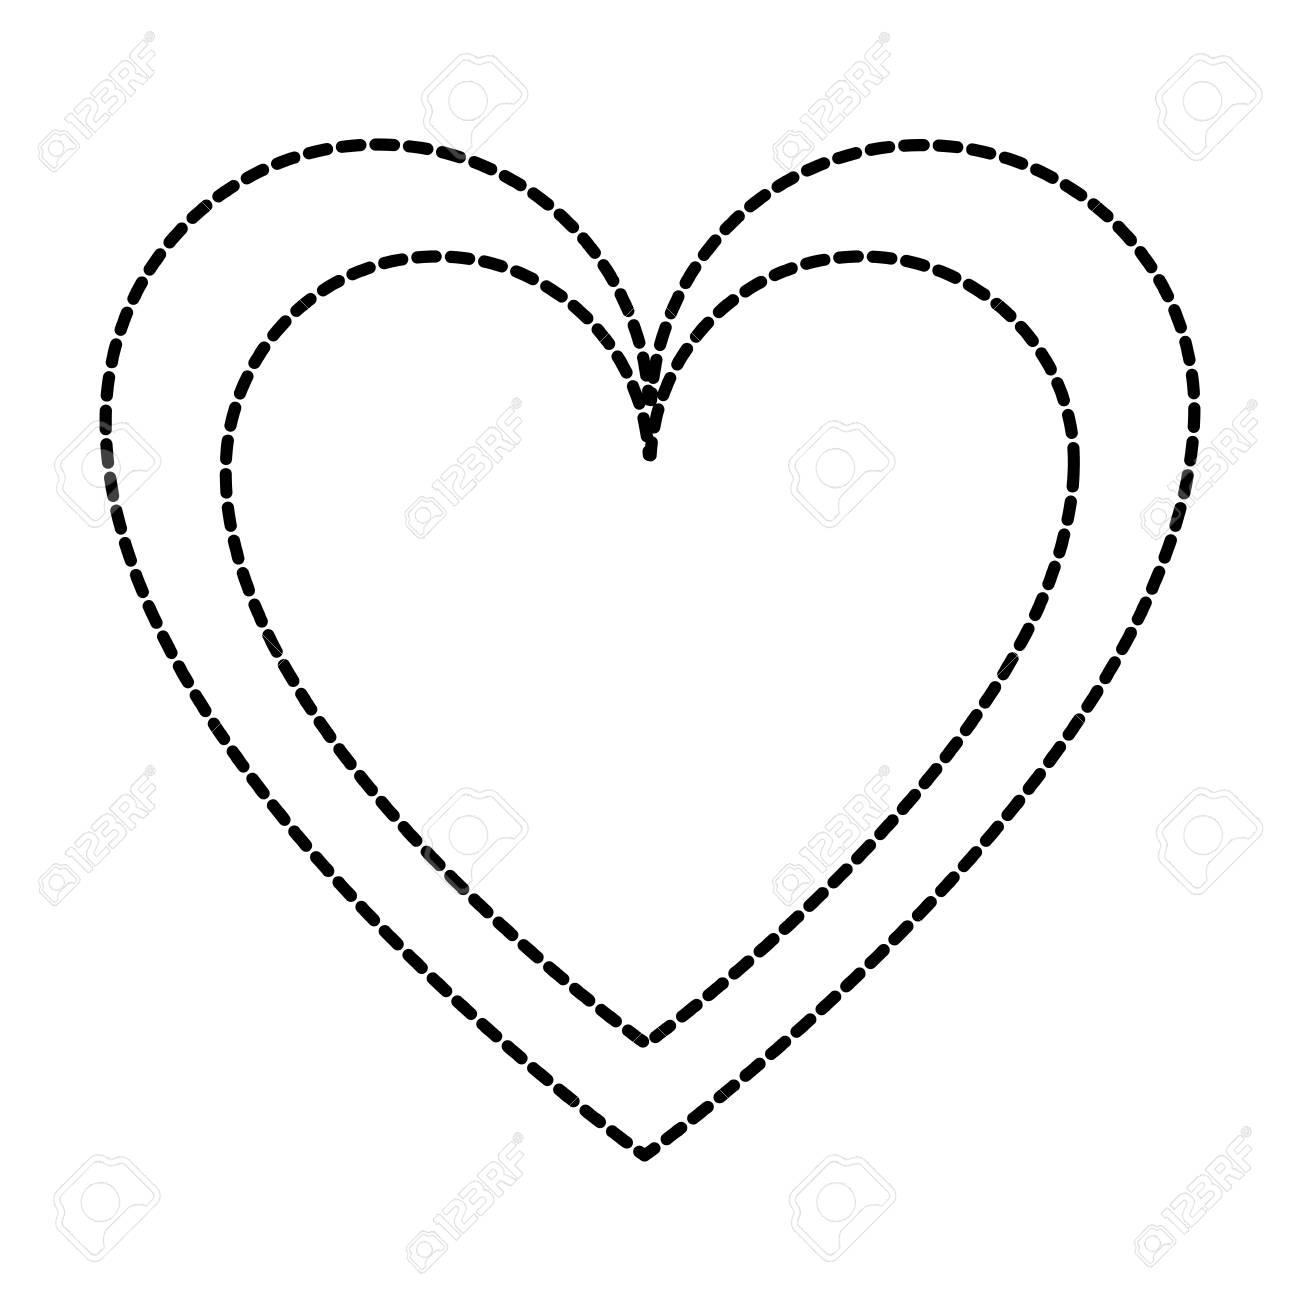 Dotted Shape Heart Love Symbol Of Passion Design Vector Illustration